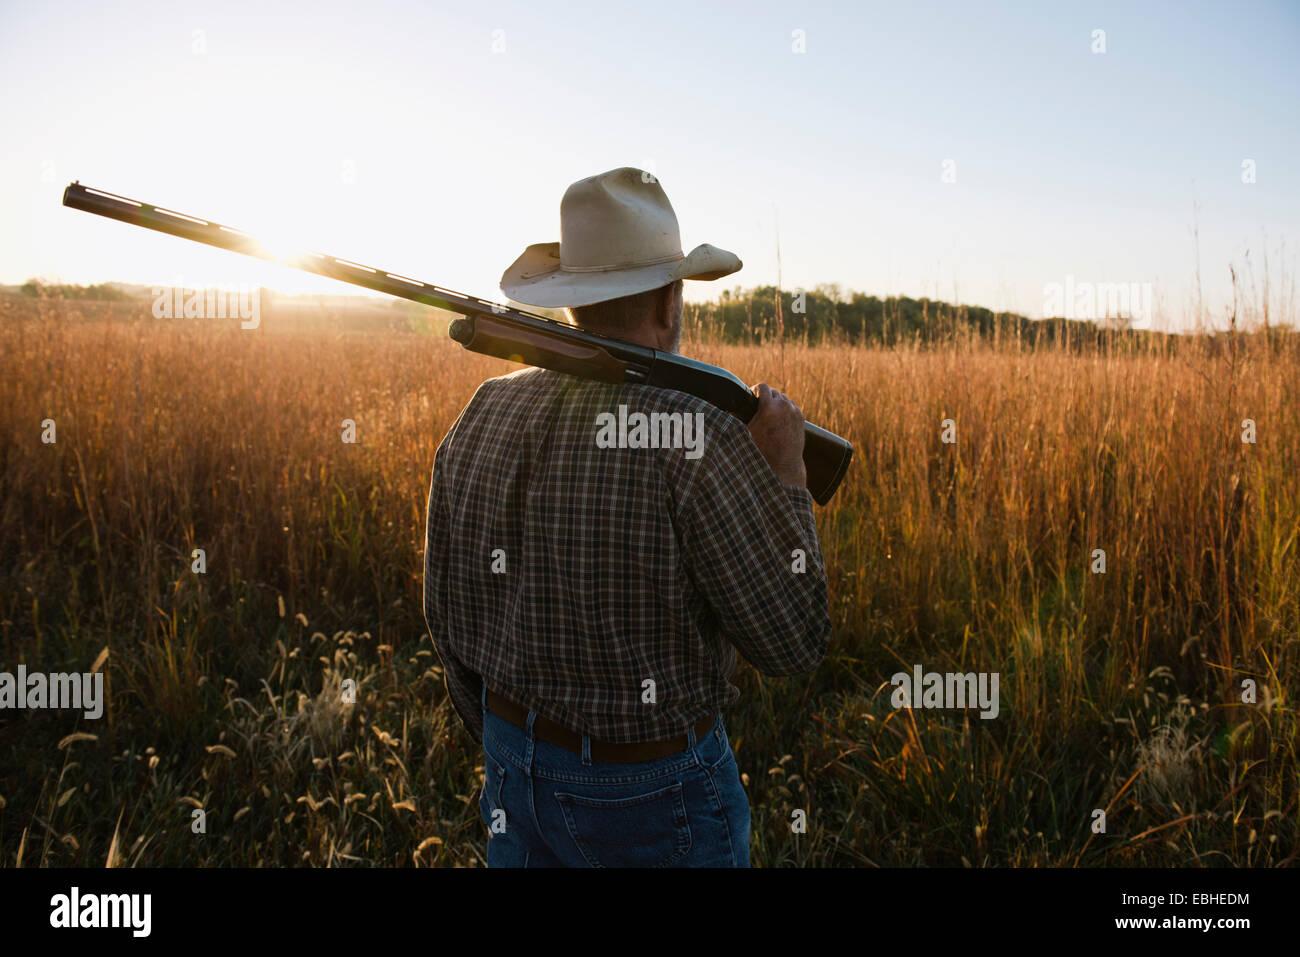 Senior male farmer with shotgun on shoulder in remote field at dusk, Plattsburg, Missouri, USA - Stock Image